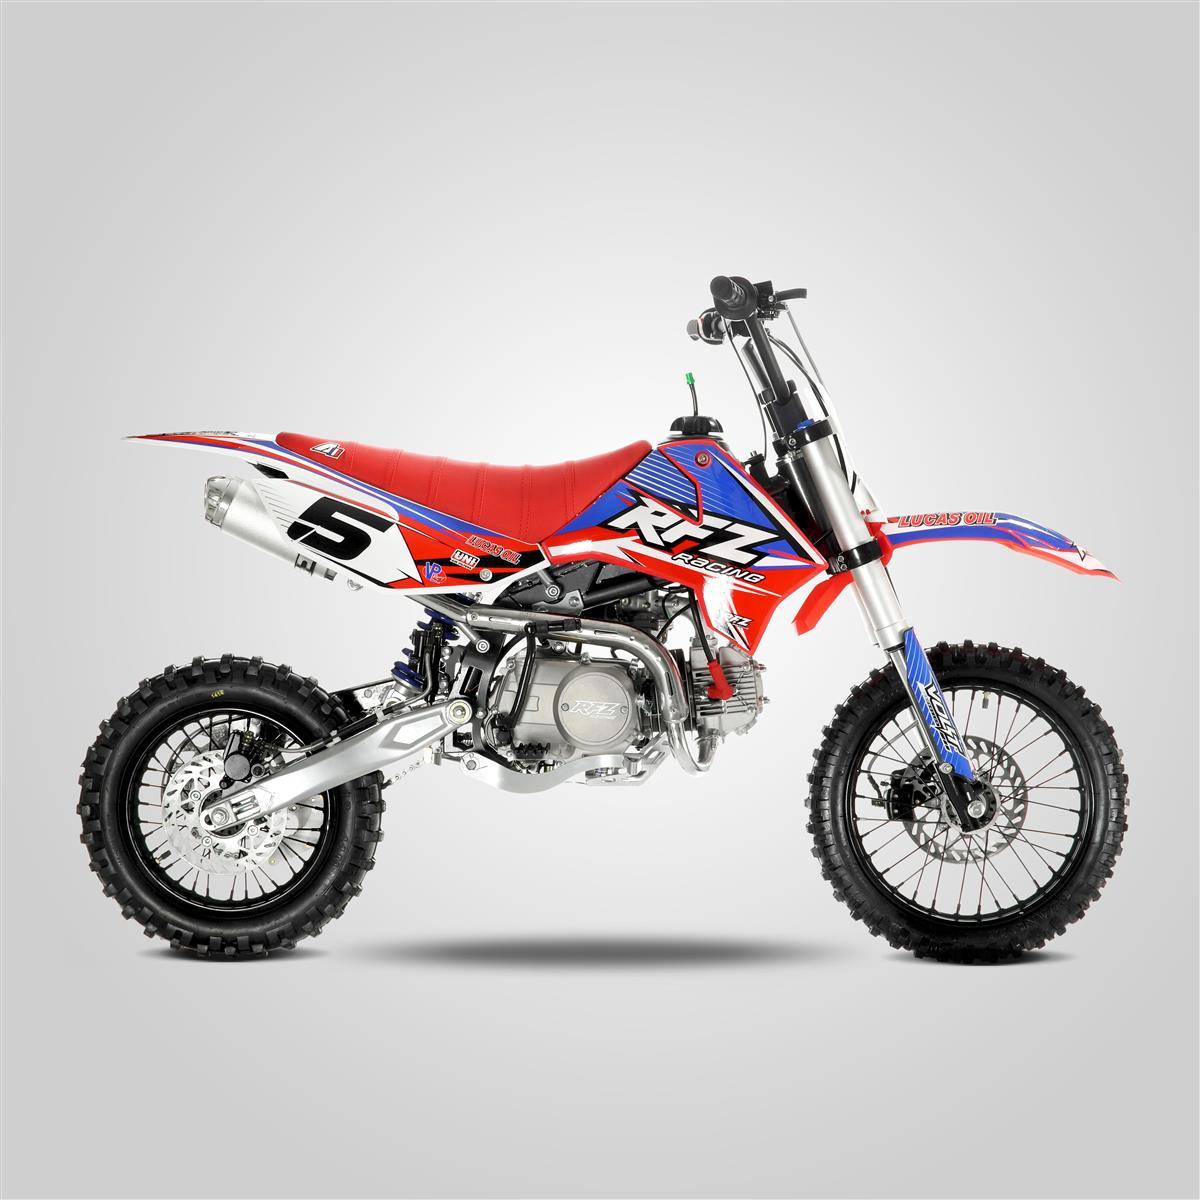 minicross apollo rfz junior 125 smallmx dirt bike pit bike. Black Bedroom Furniture Sets. Home Design Ideas